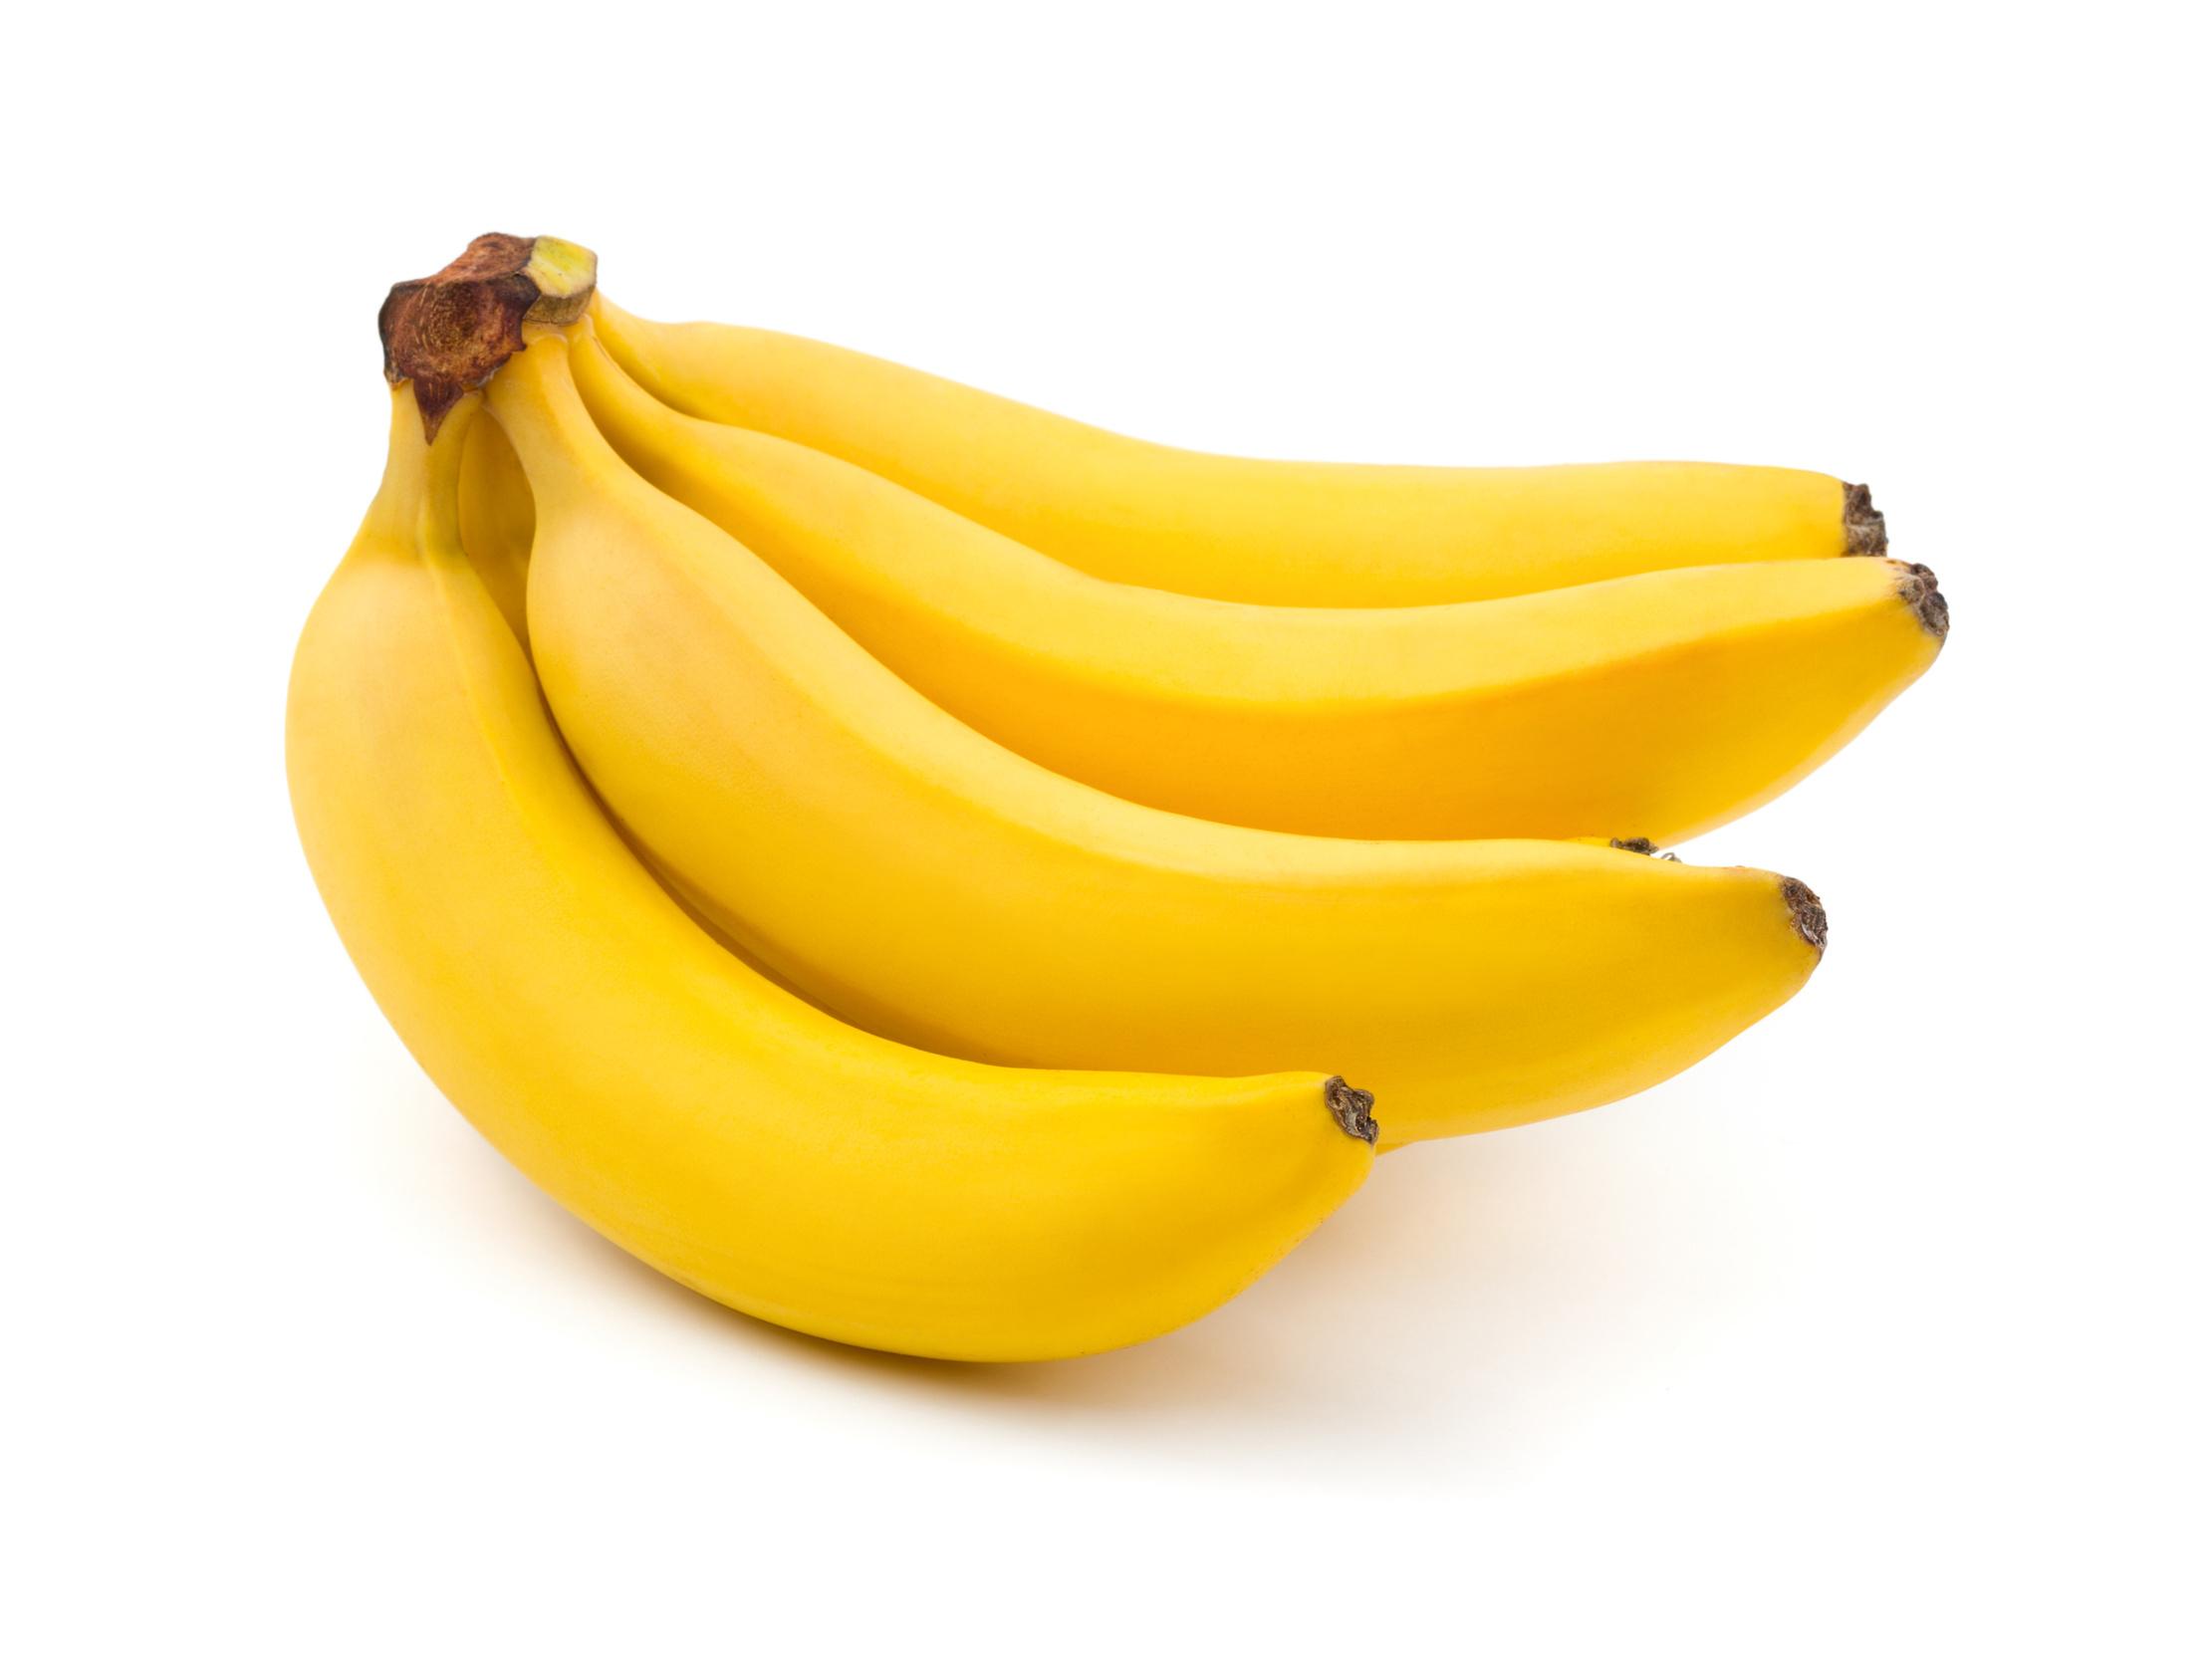 5 Benefits of Eating Bananas